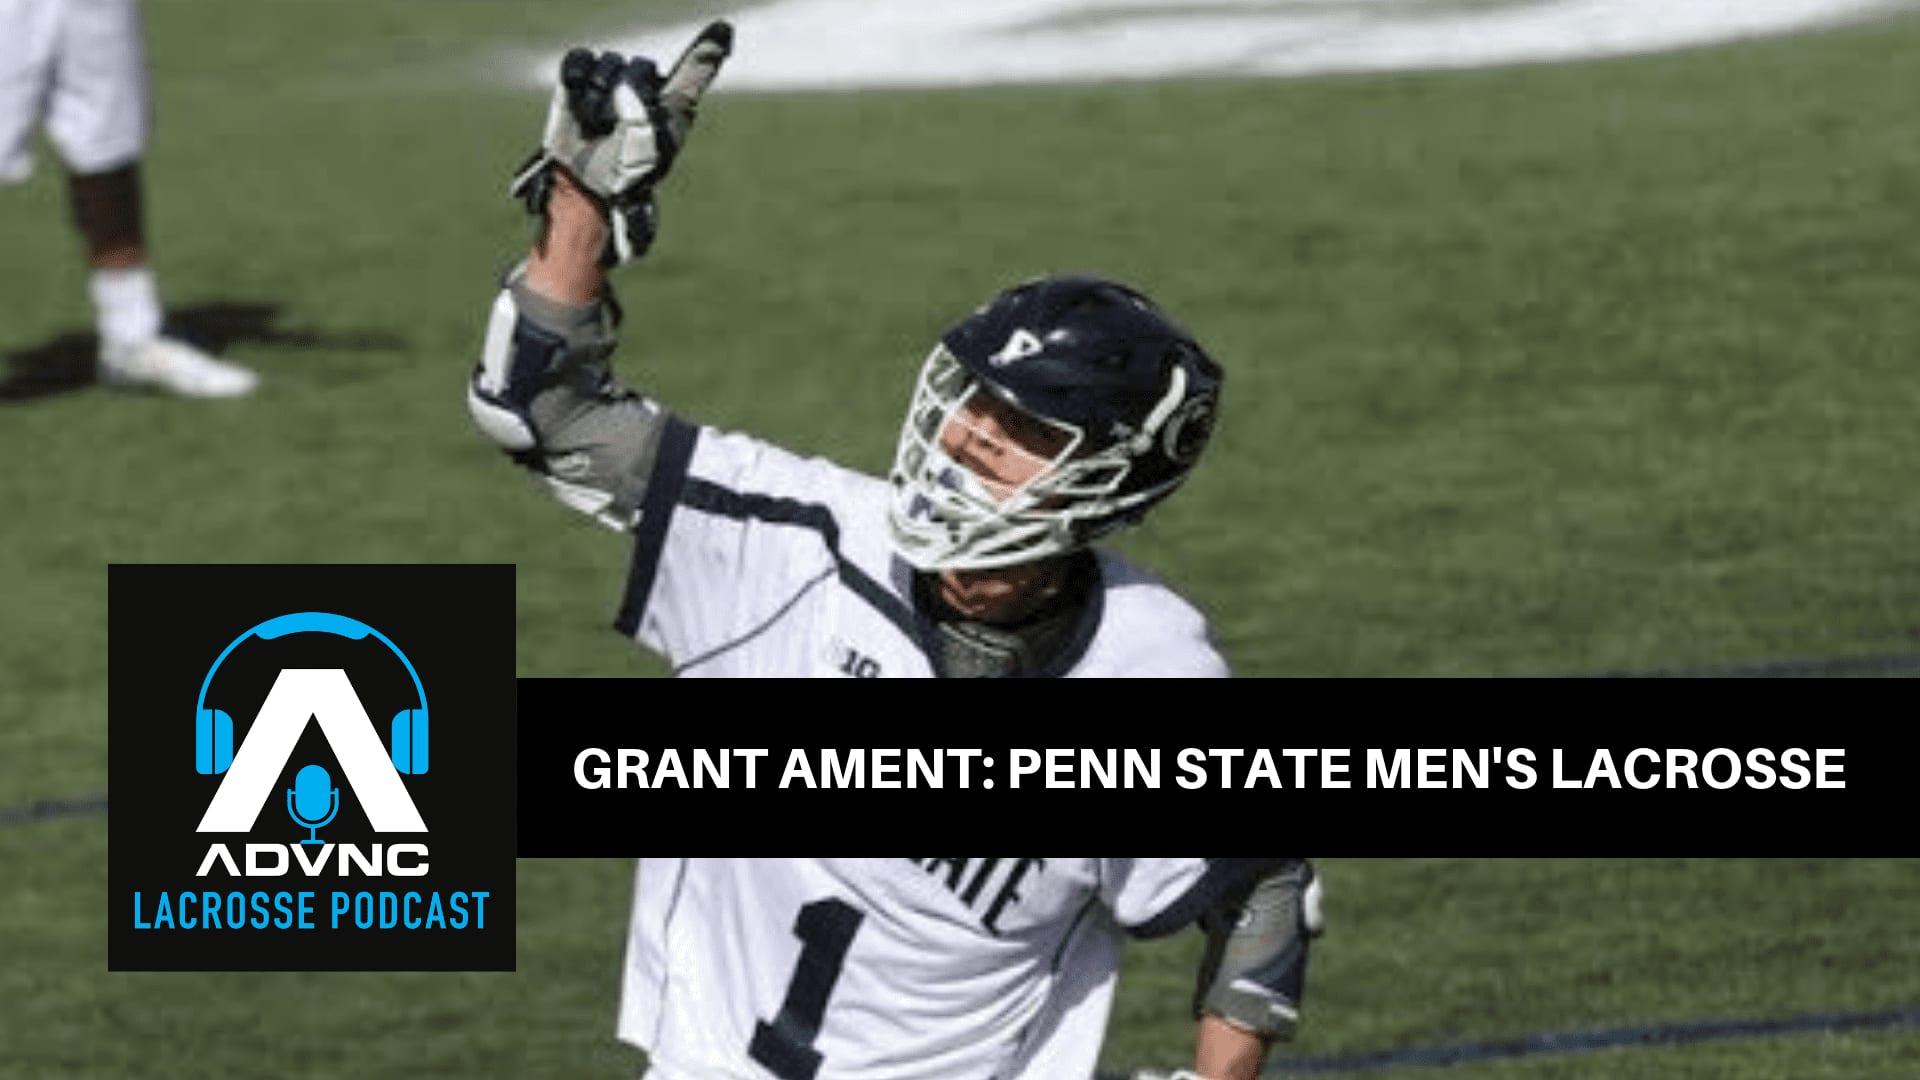 grant ament penn state men's lacrosse advnc lacrosse podcast